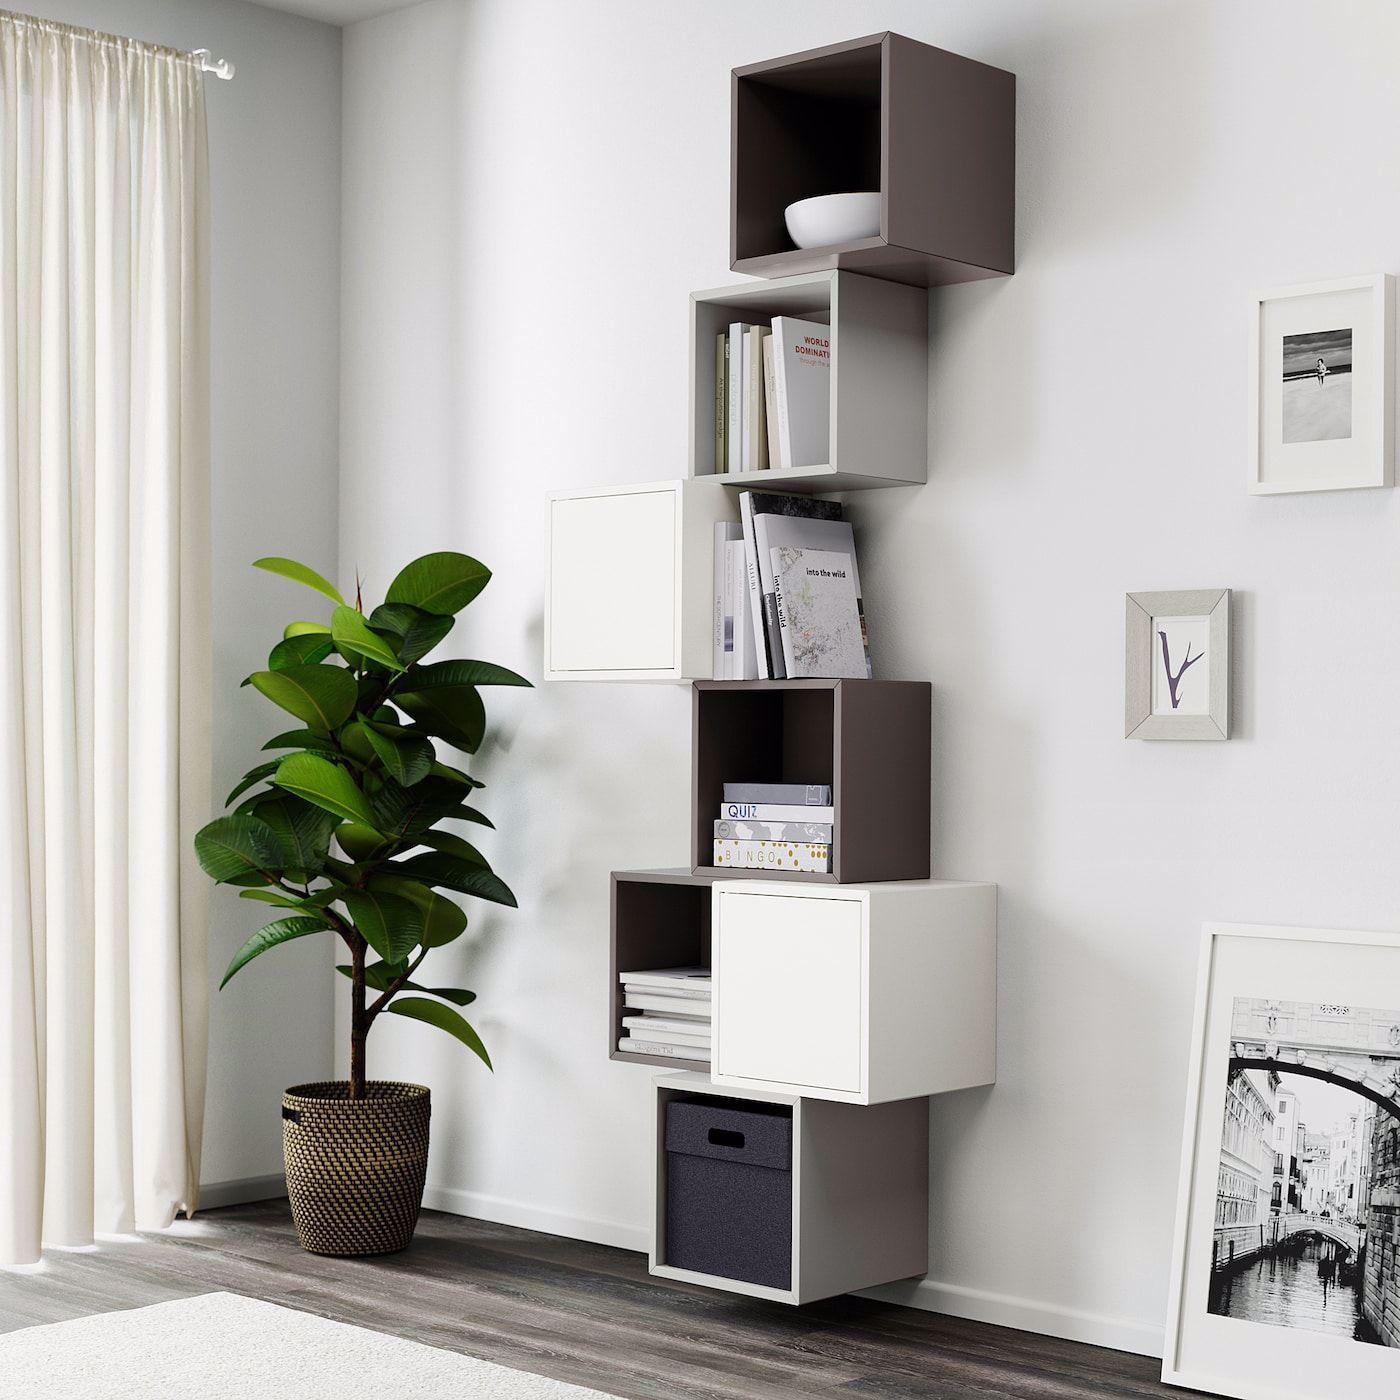 Libreria Da Parete Ikea librerie a parete fai da te ikea in 2020 | eket, wall